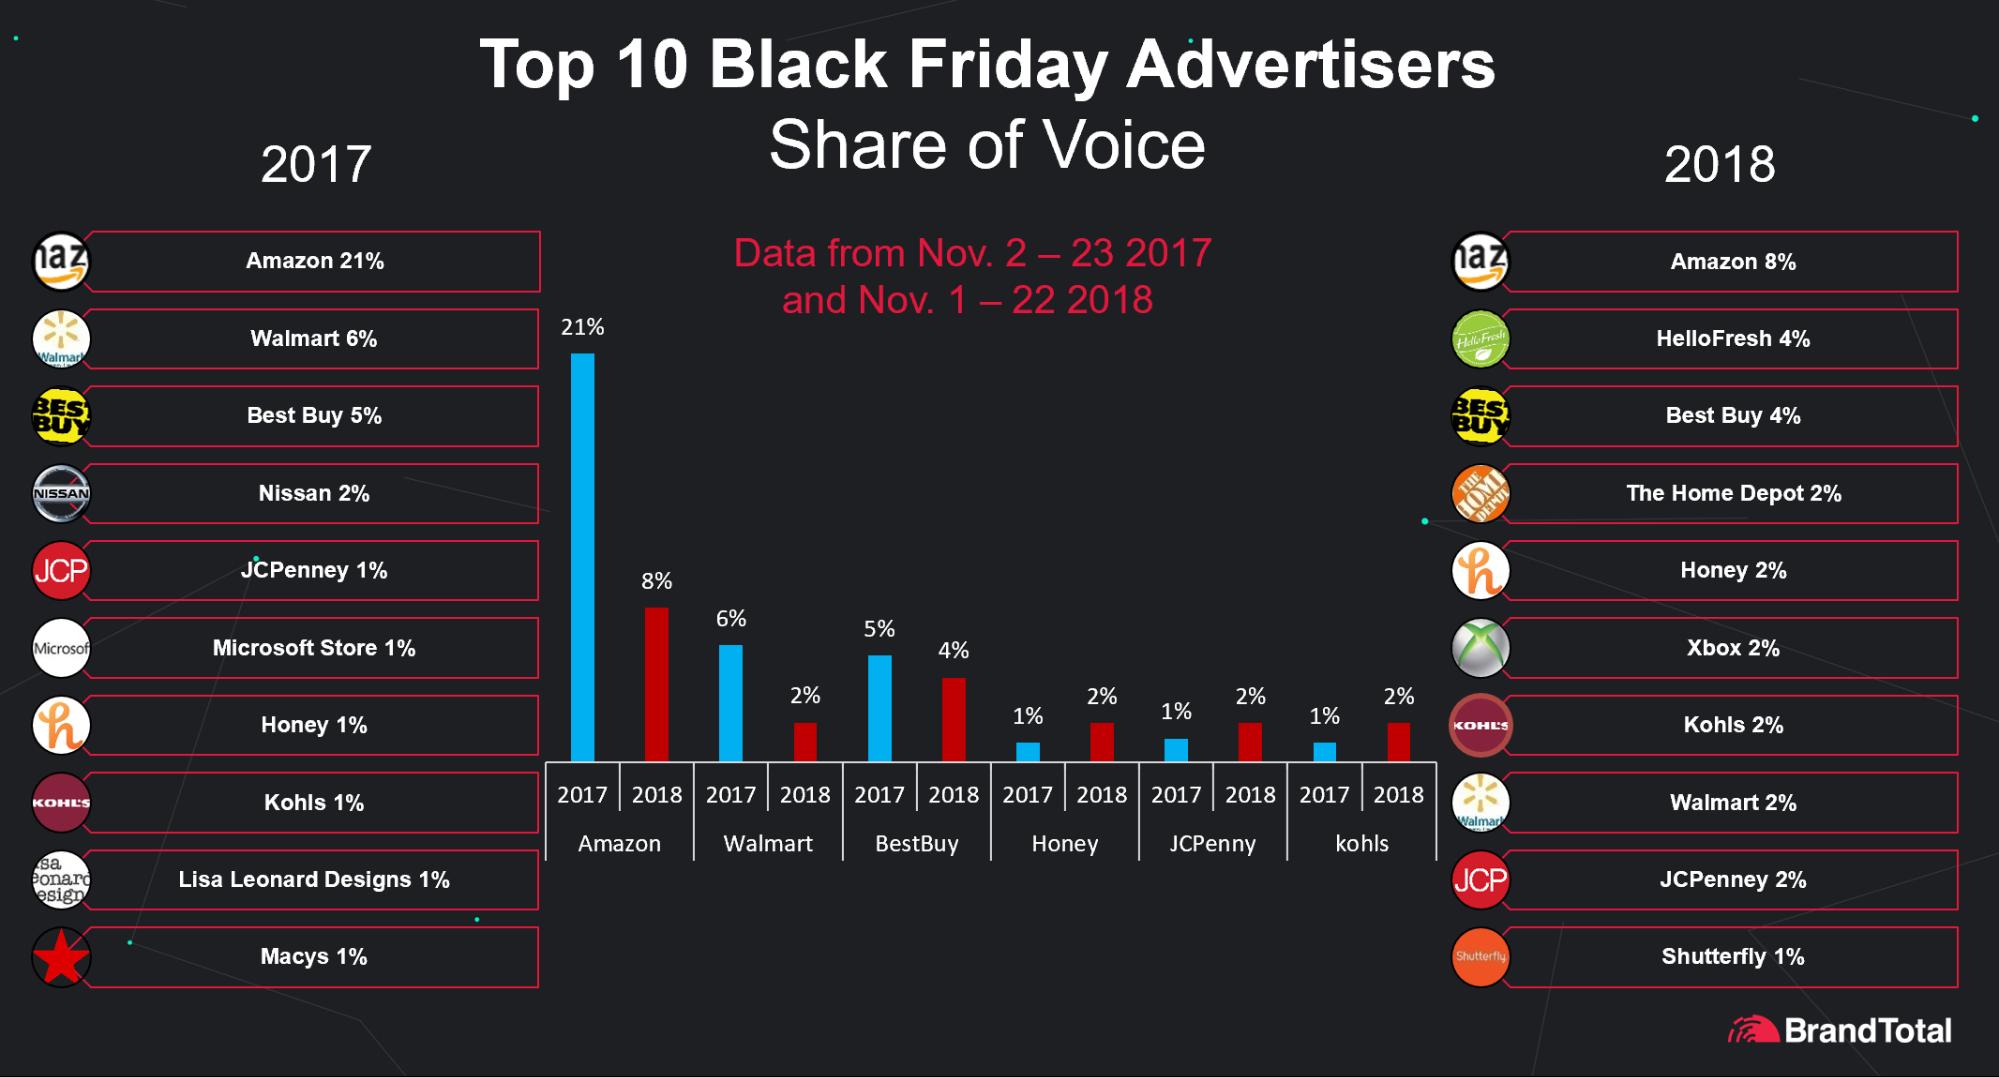 5bf7fd24cc063af5a4731446_Top 10 Black Friday Advertisers